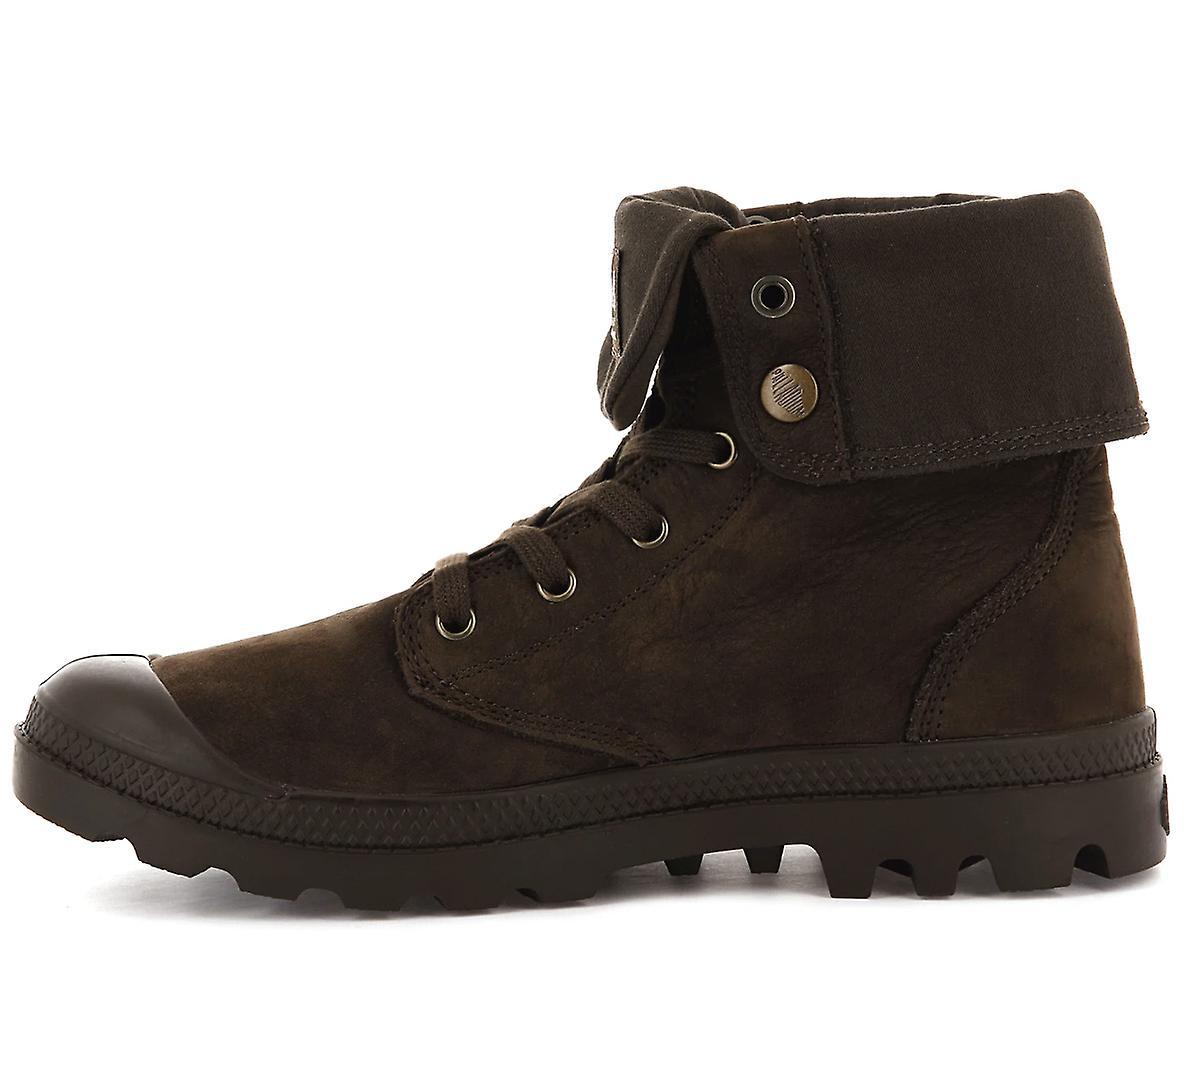 Palladium Pampa Baggy NBK U 76434-255-M Herren Boots Braun Sneakers Sportschuhe